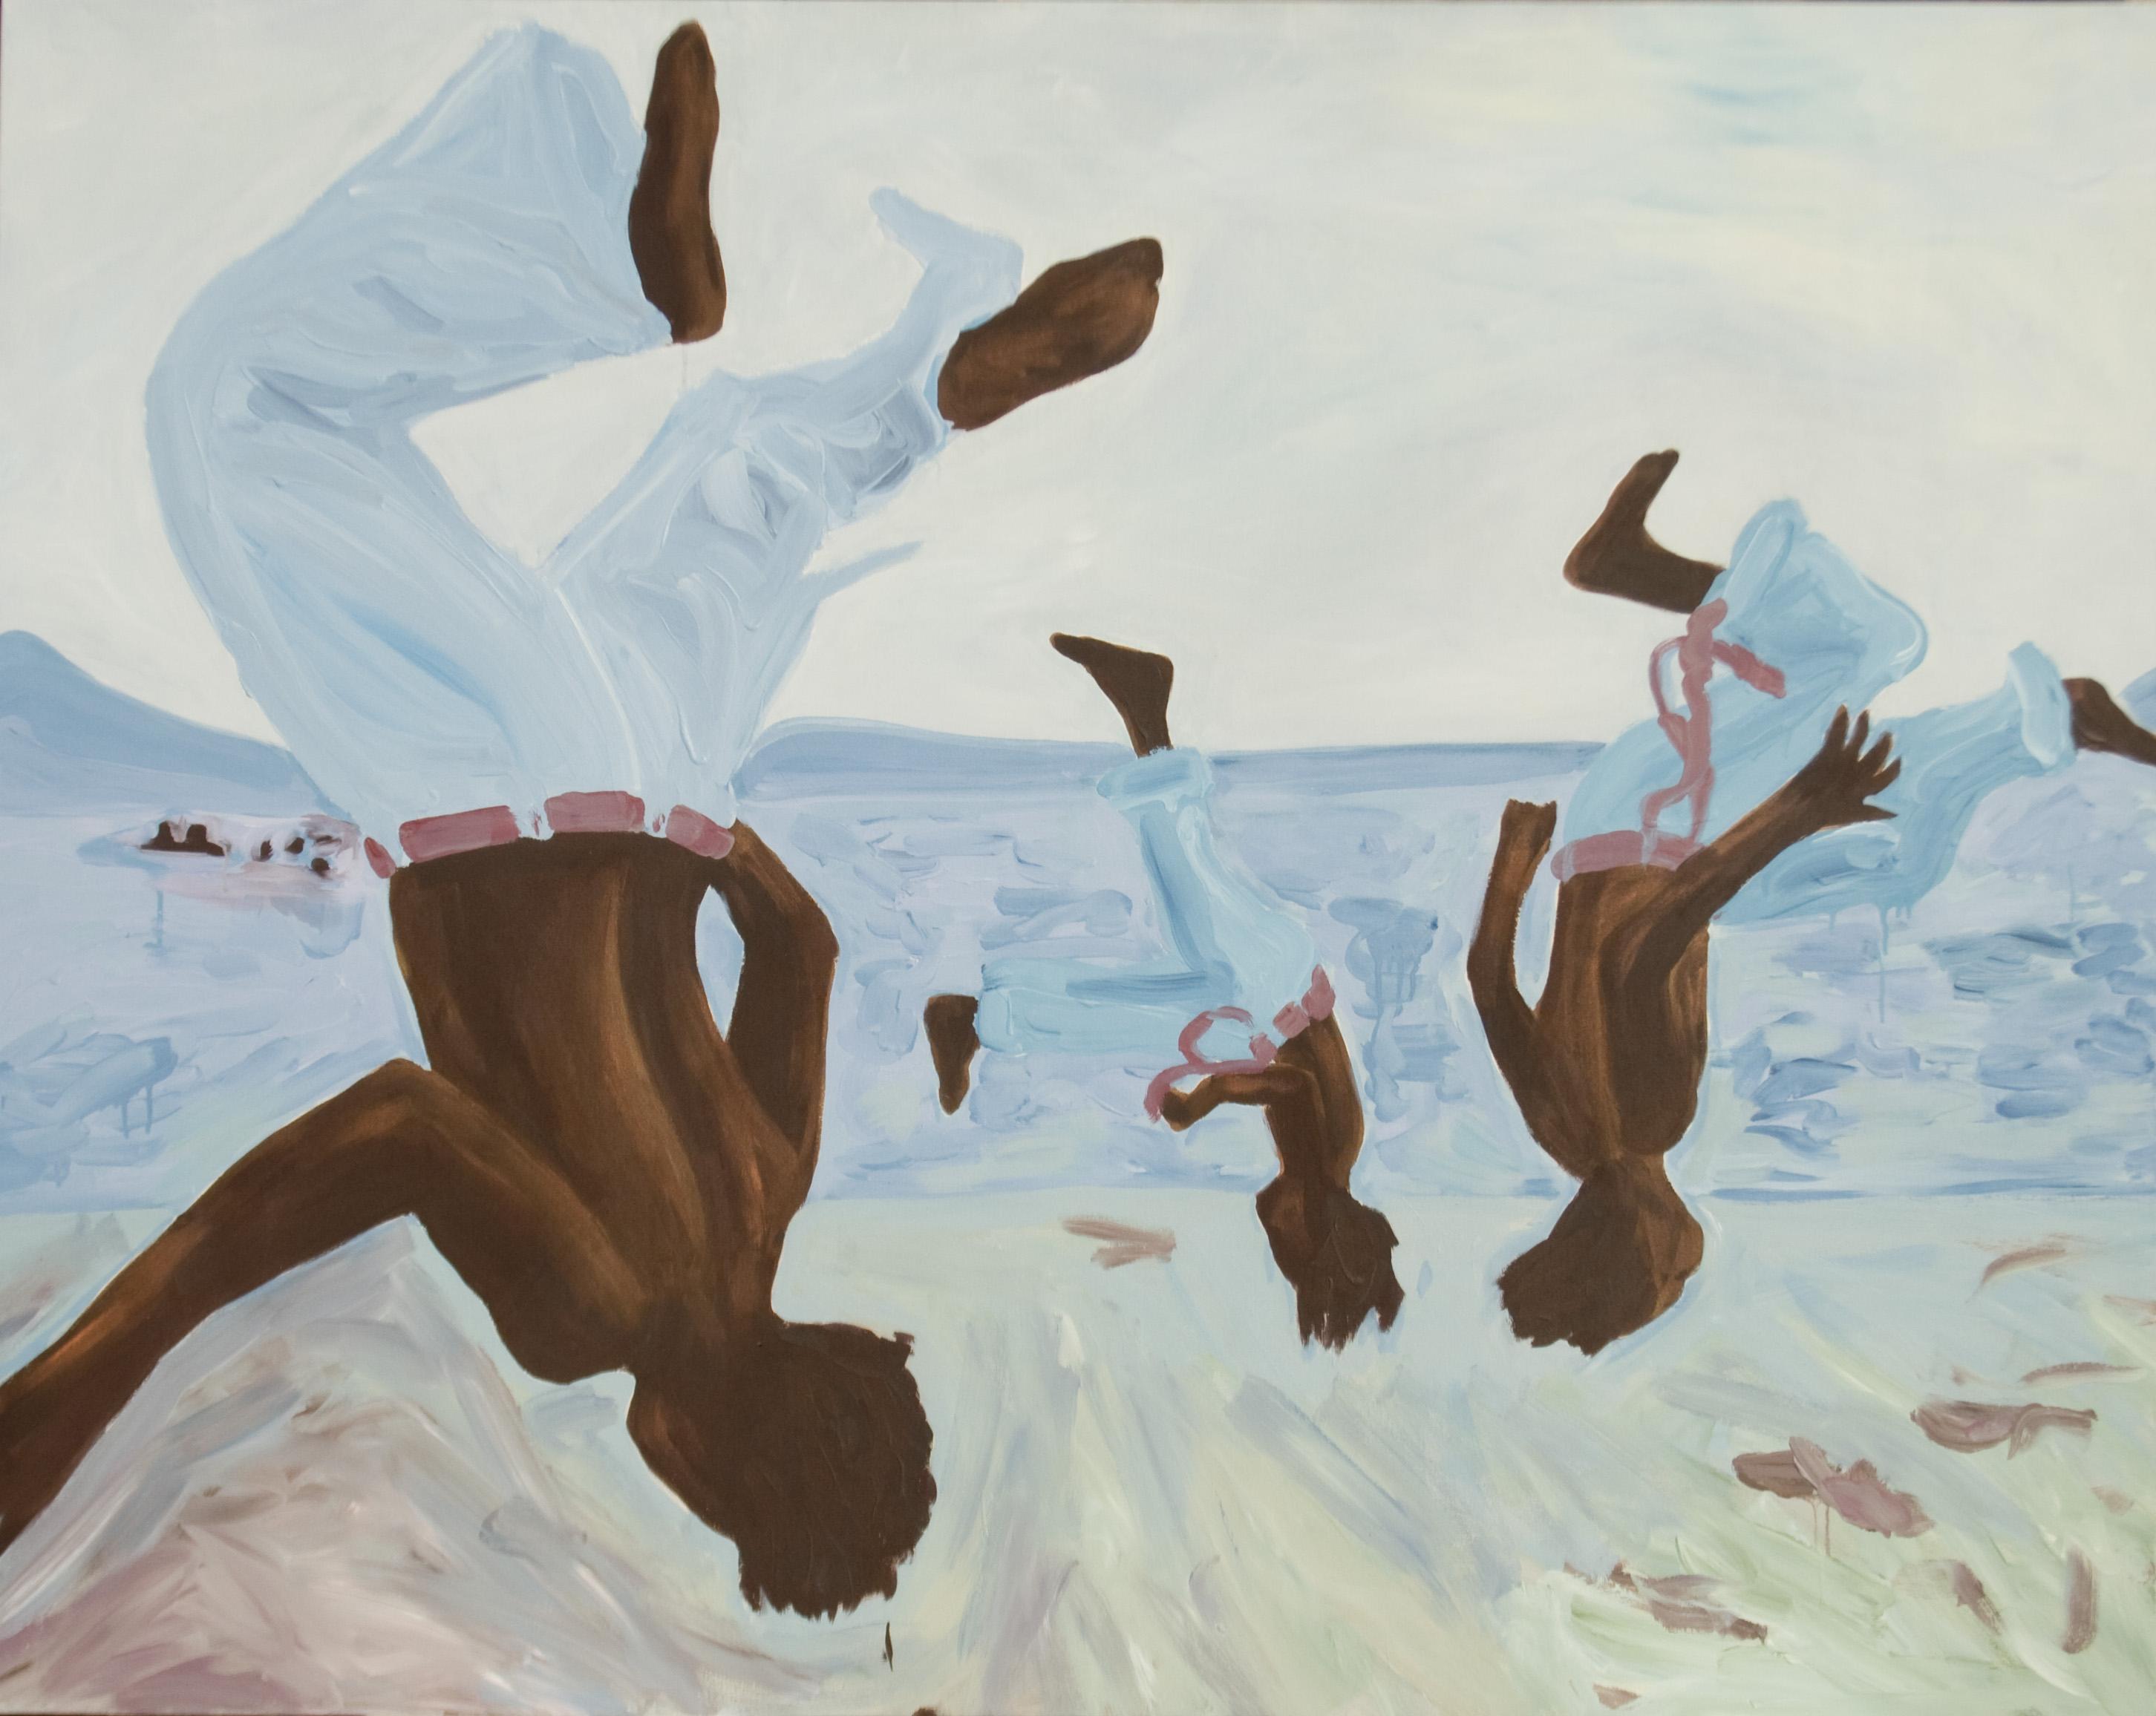 capoeira_boys_upside_down_capoeiraseries_2016